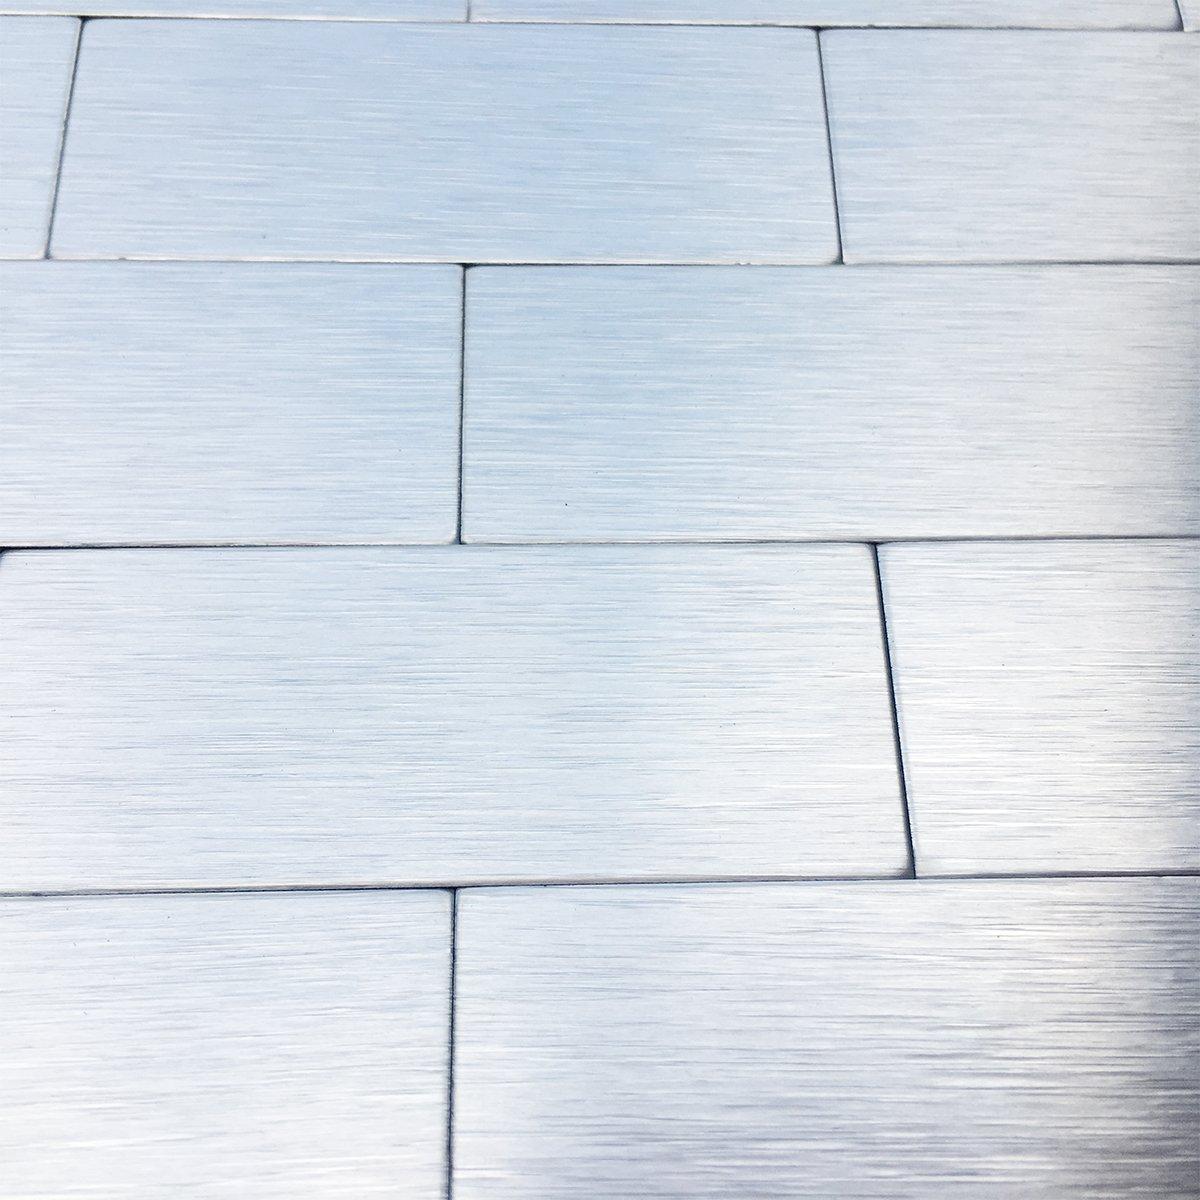 Art3d Peel and Stick Metal Backsplash Tile for Kitchen / Bathroom, Brush Silver Alumimium